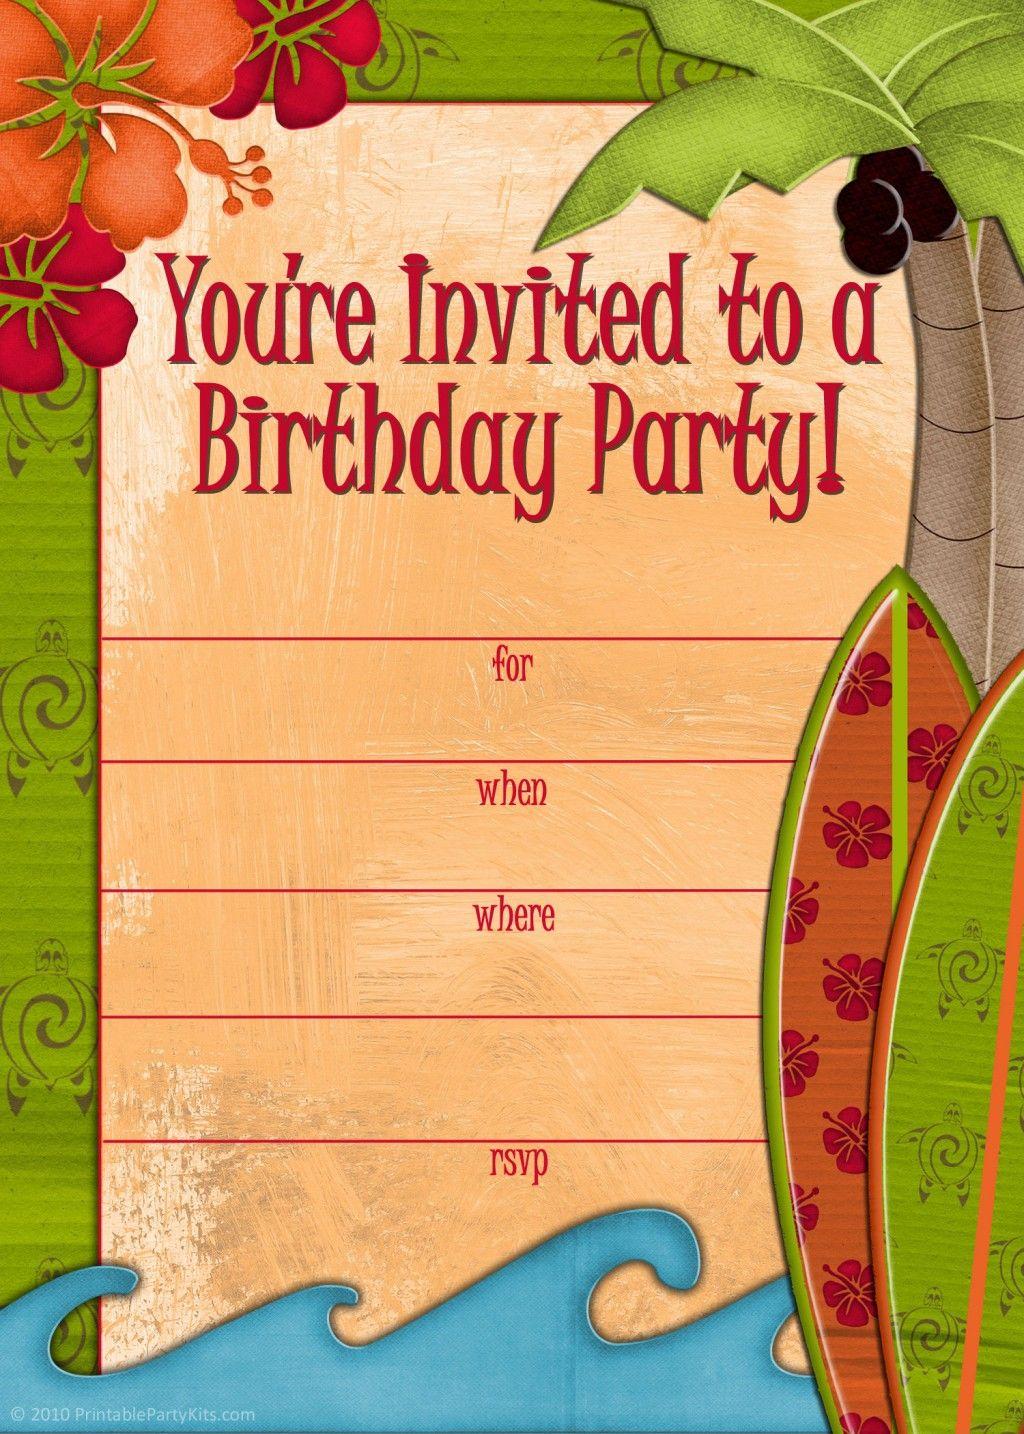 Free Printable Beach Party Luau And BBQ Invitations Templates - Beach birthday invitation templates